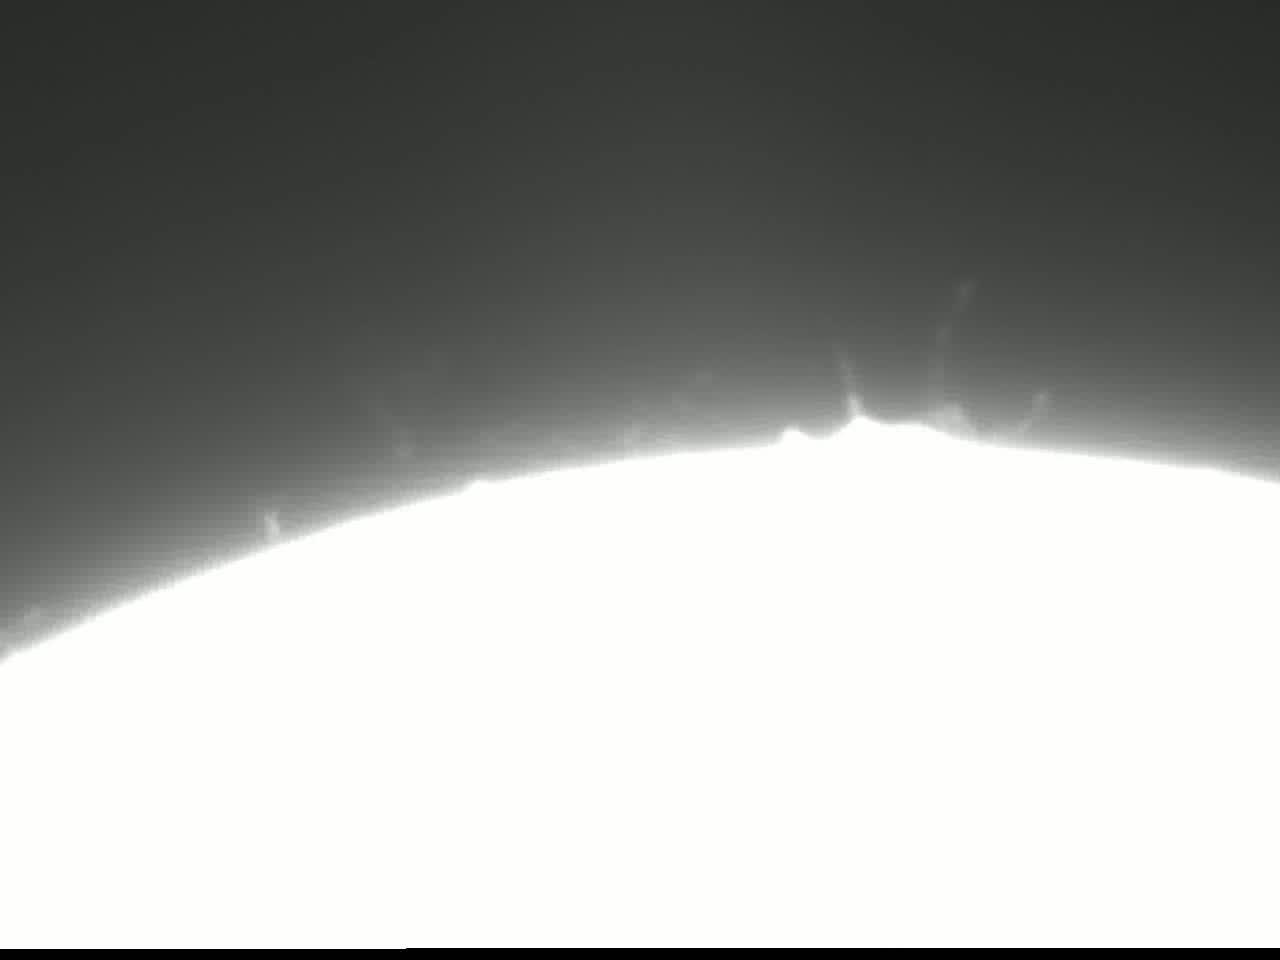 20110904-Sun-Video 11-09-04 14-45-03